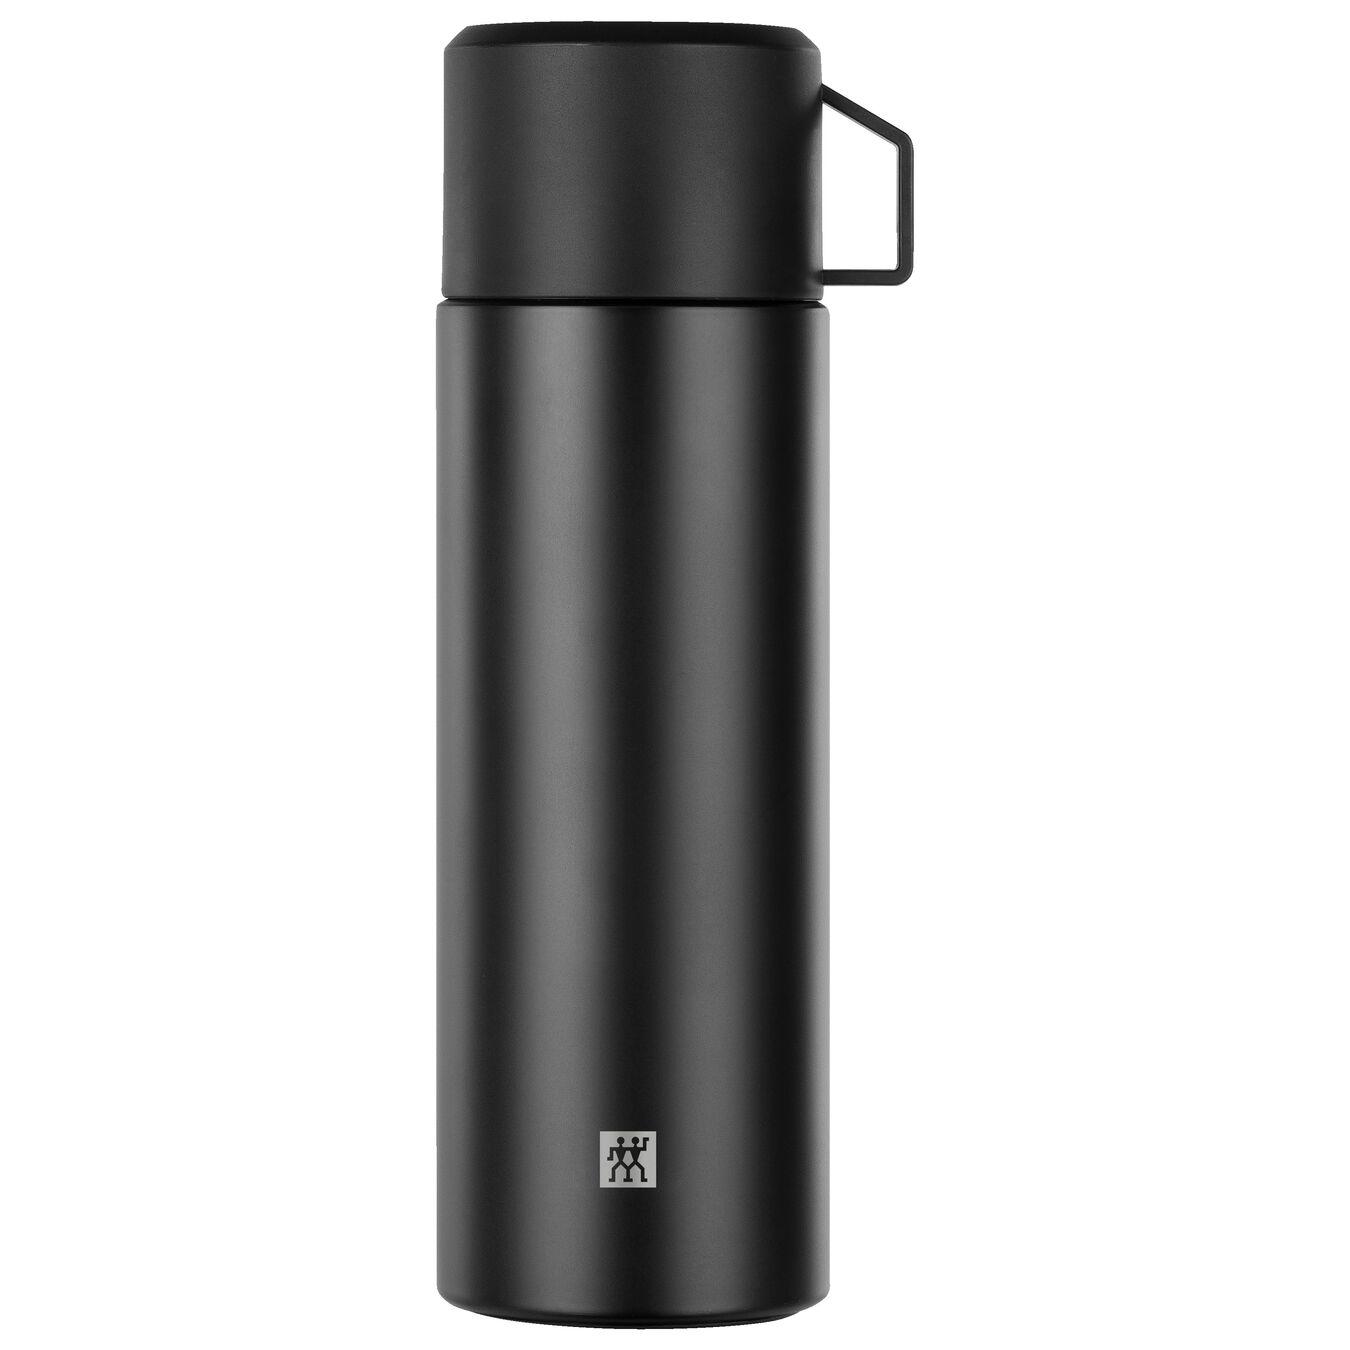 Bottiglia termica - 1 l, acciaio inox,,large 1